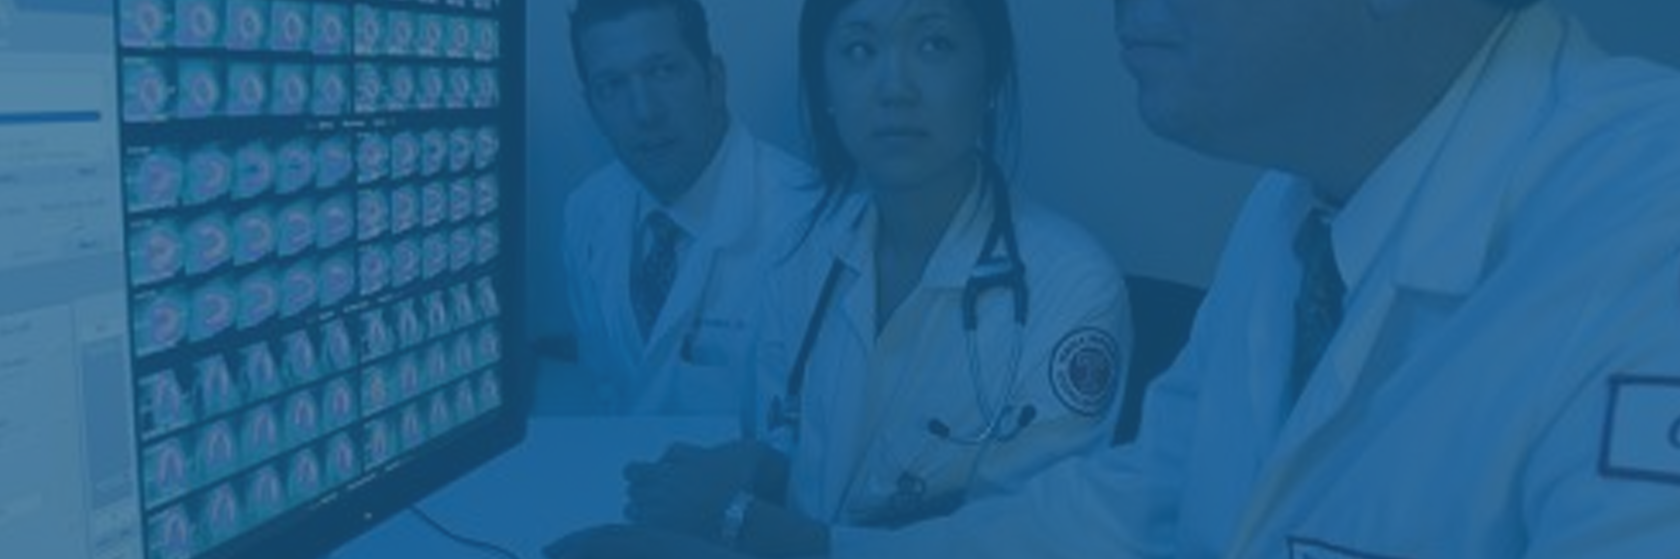 AI Powered Cardiovascular MRI Analysis Tool